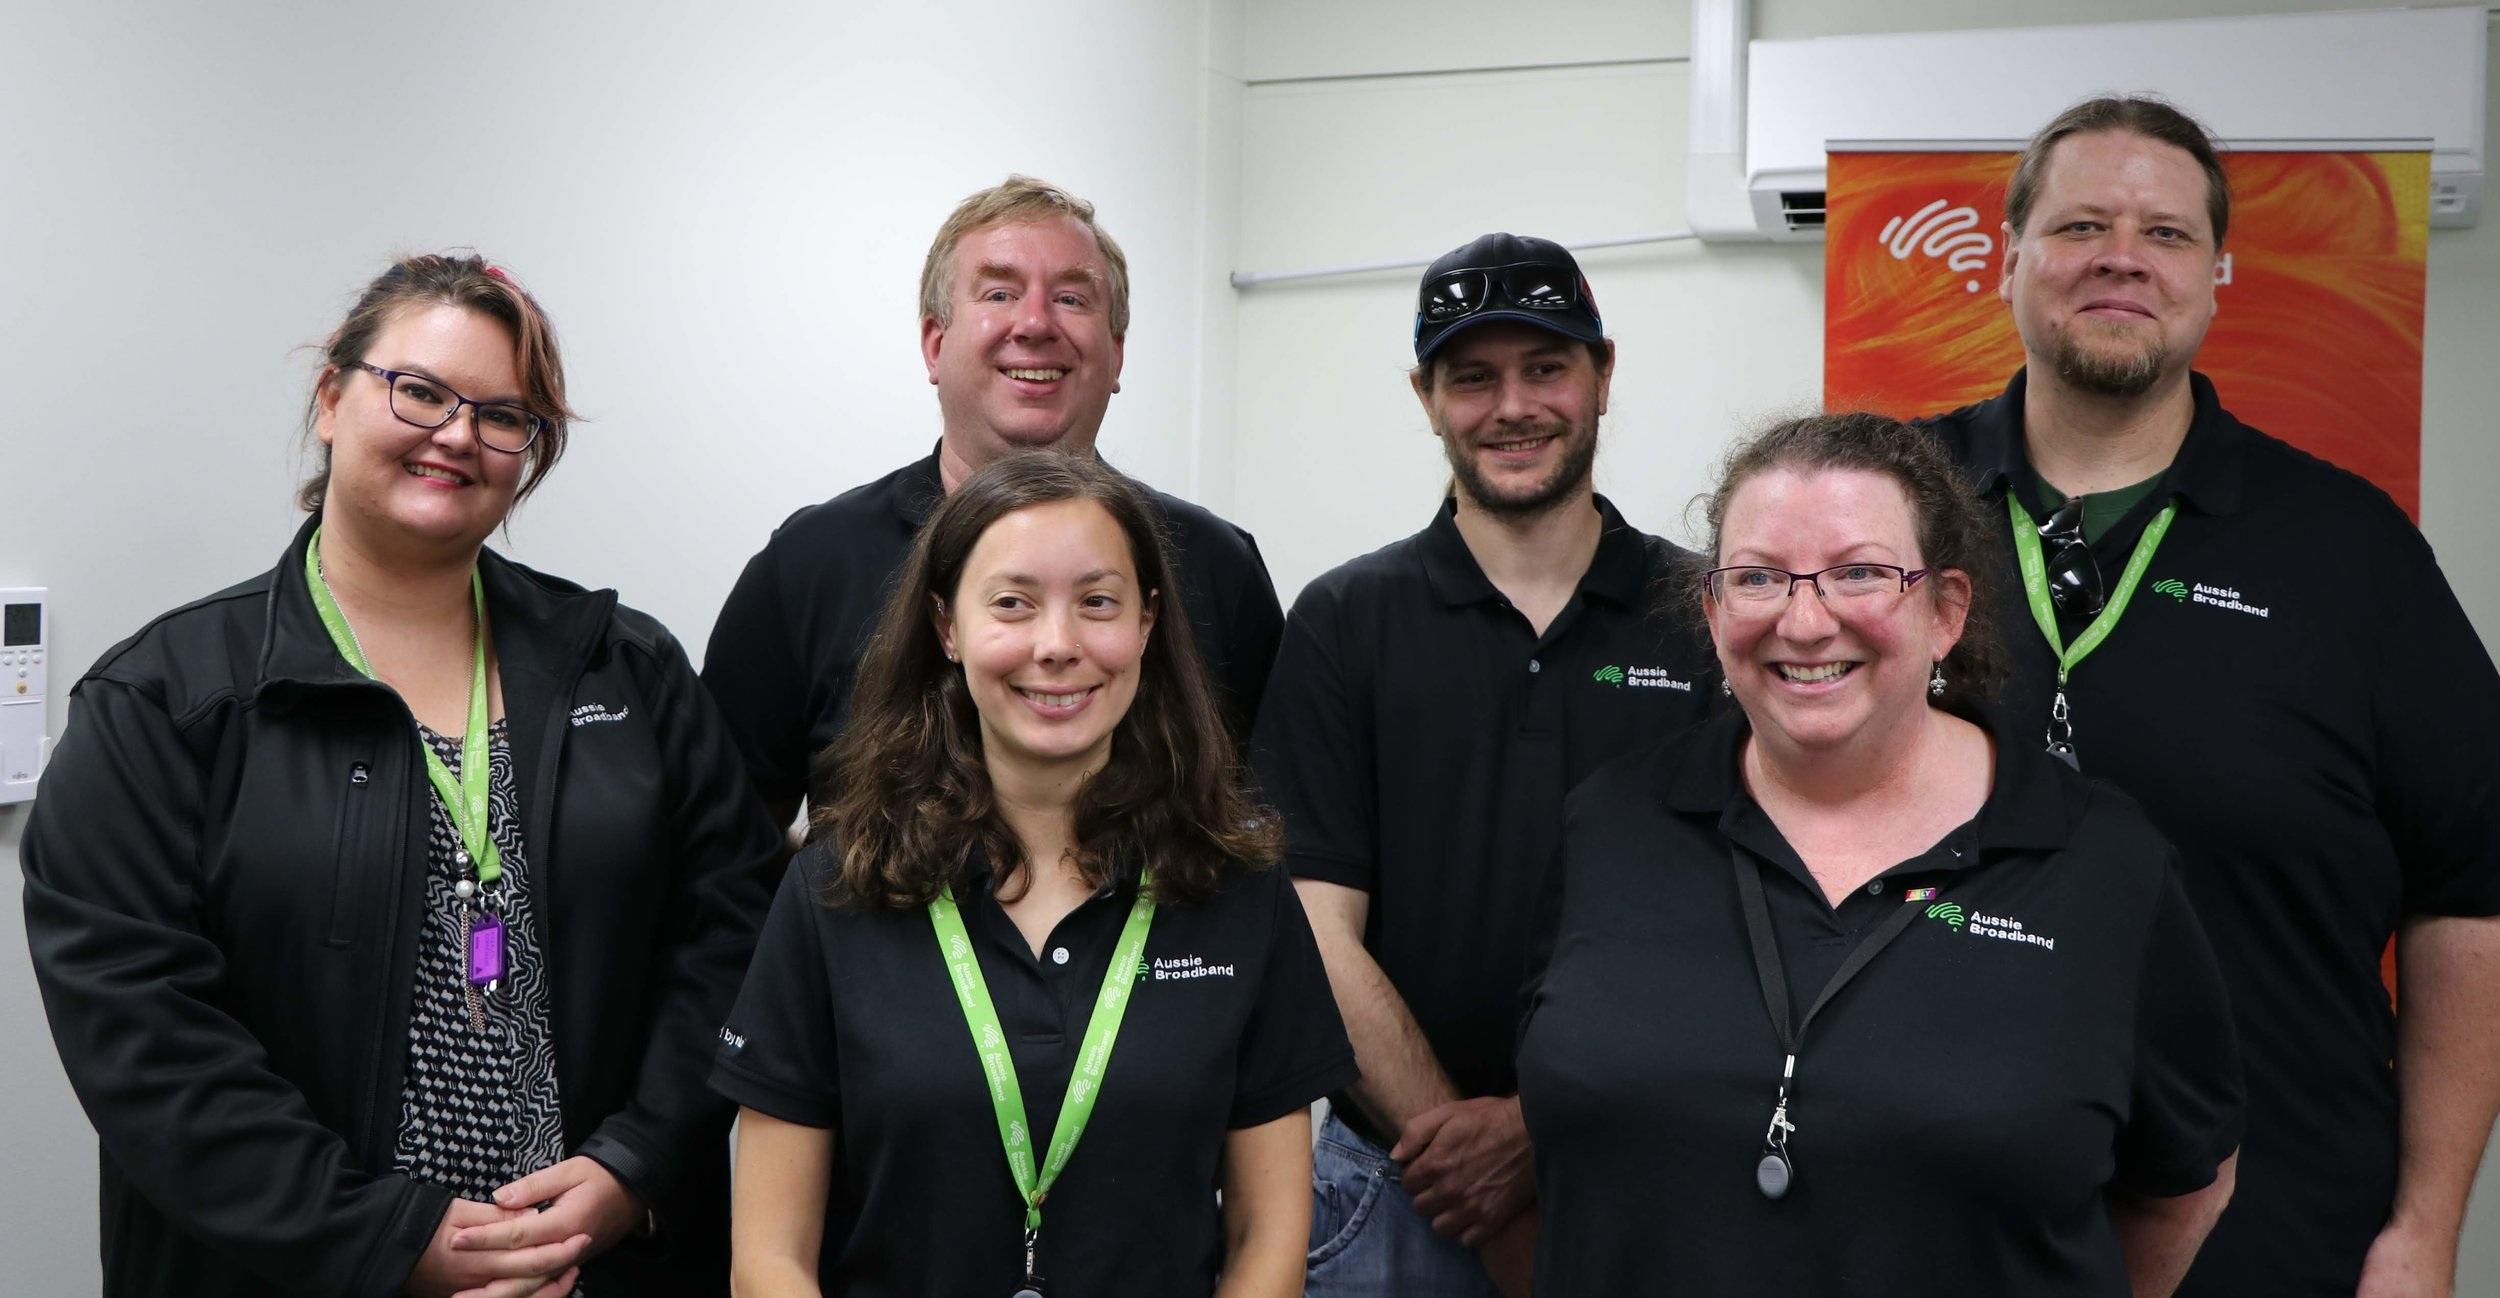 Our recent Aussie Broadband graduates and staff.